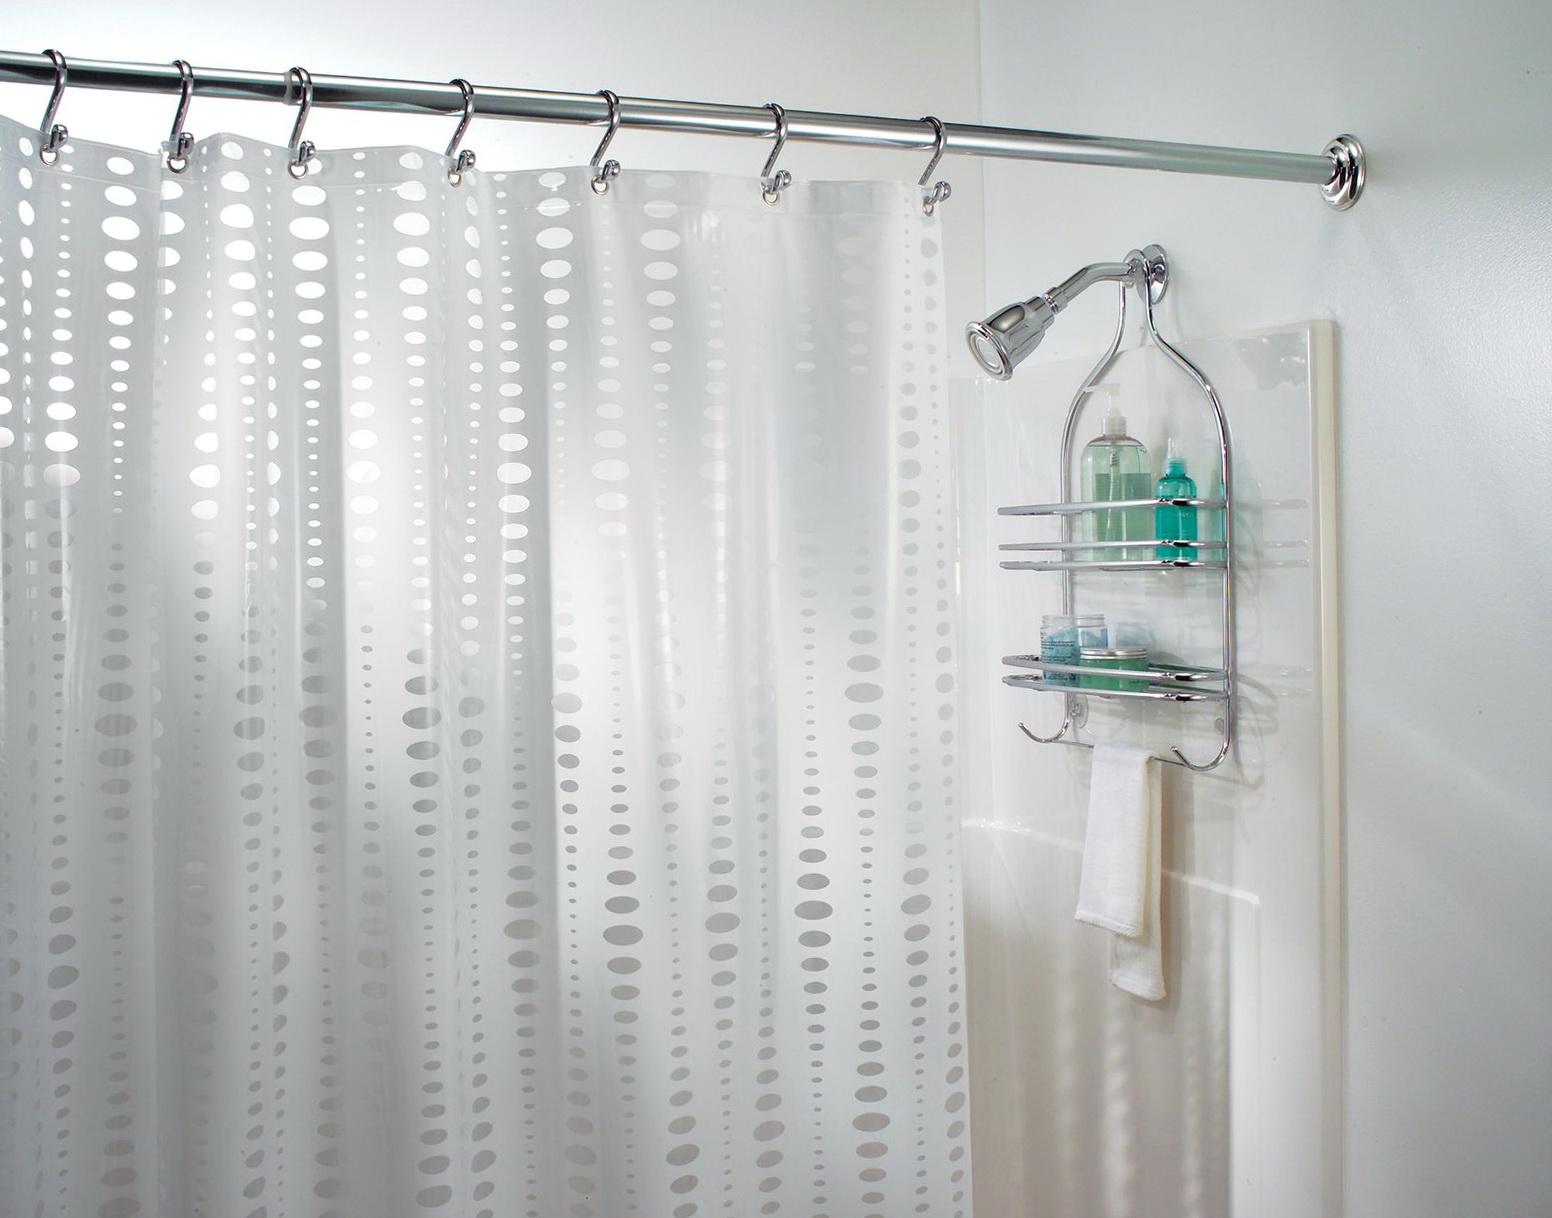 Standard Shower Curtain Length Uk